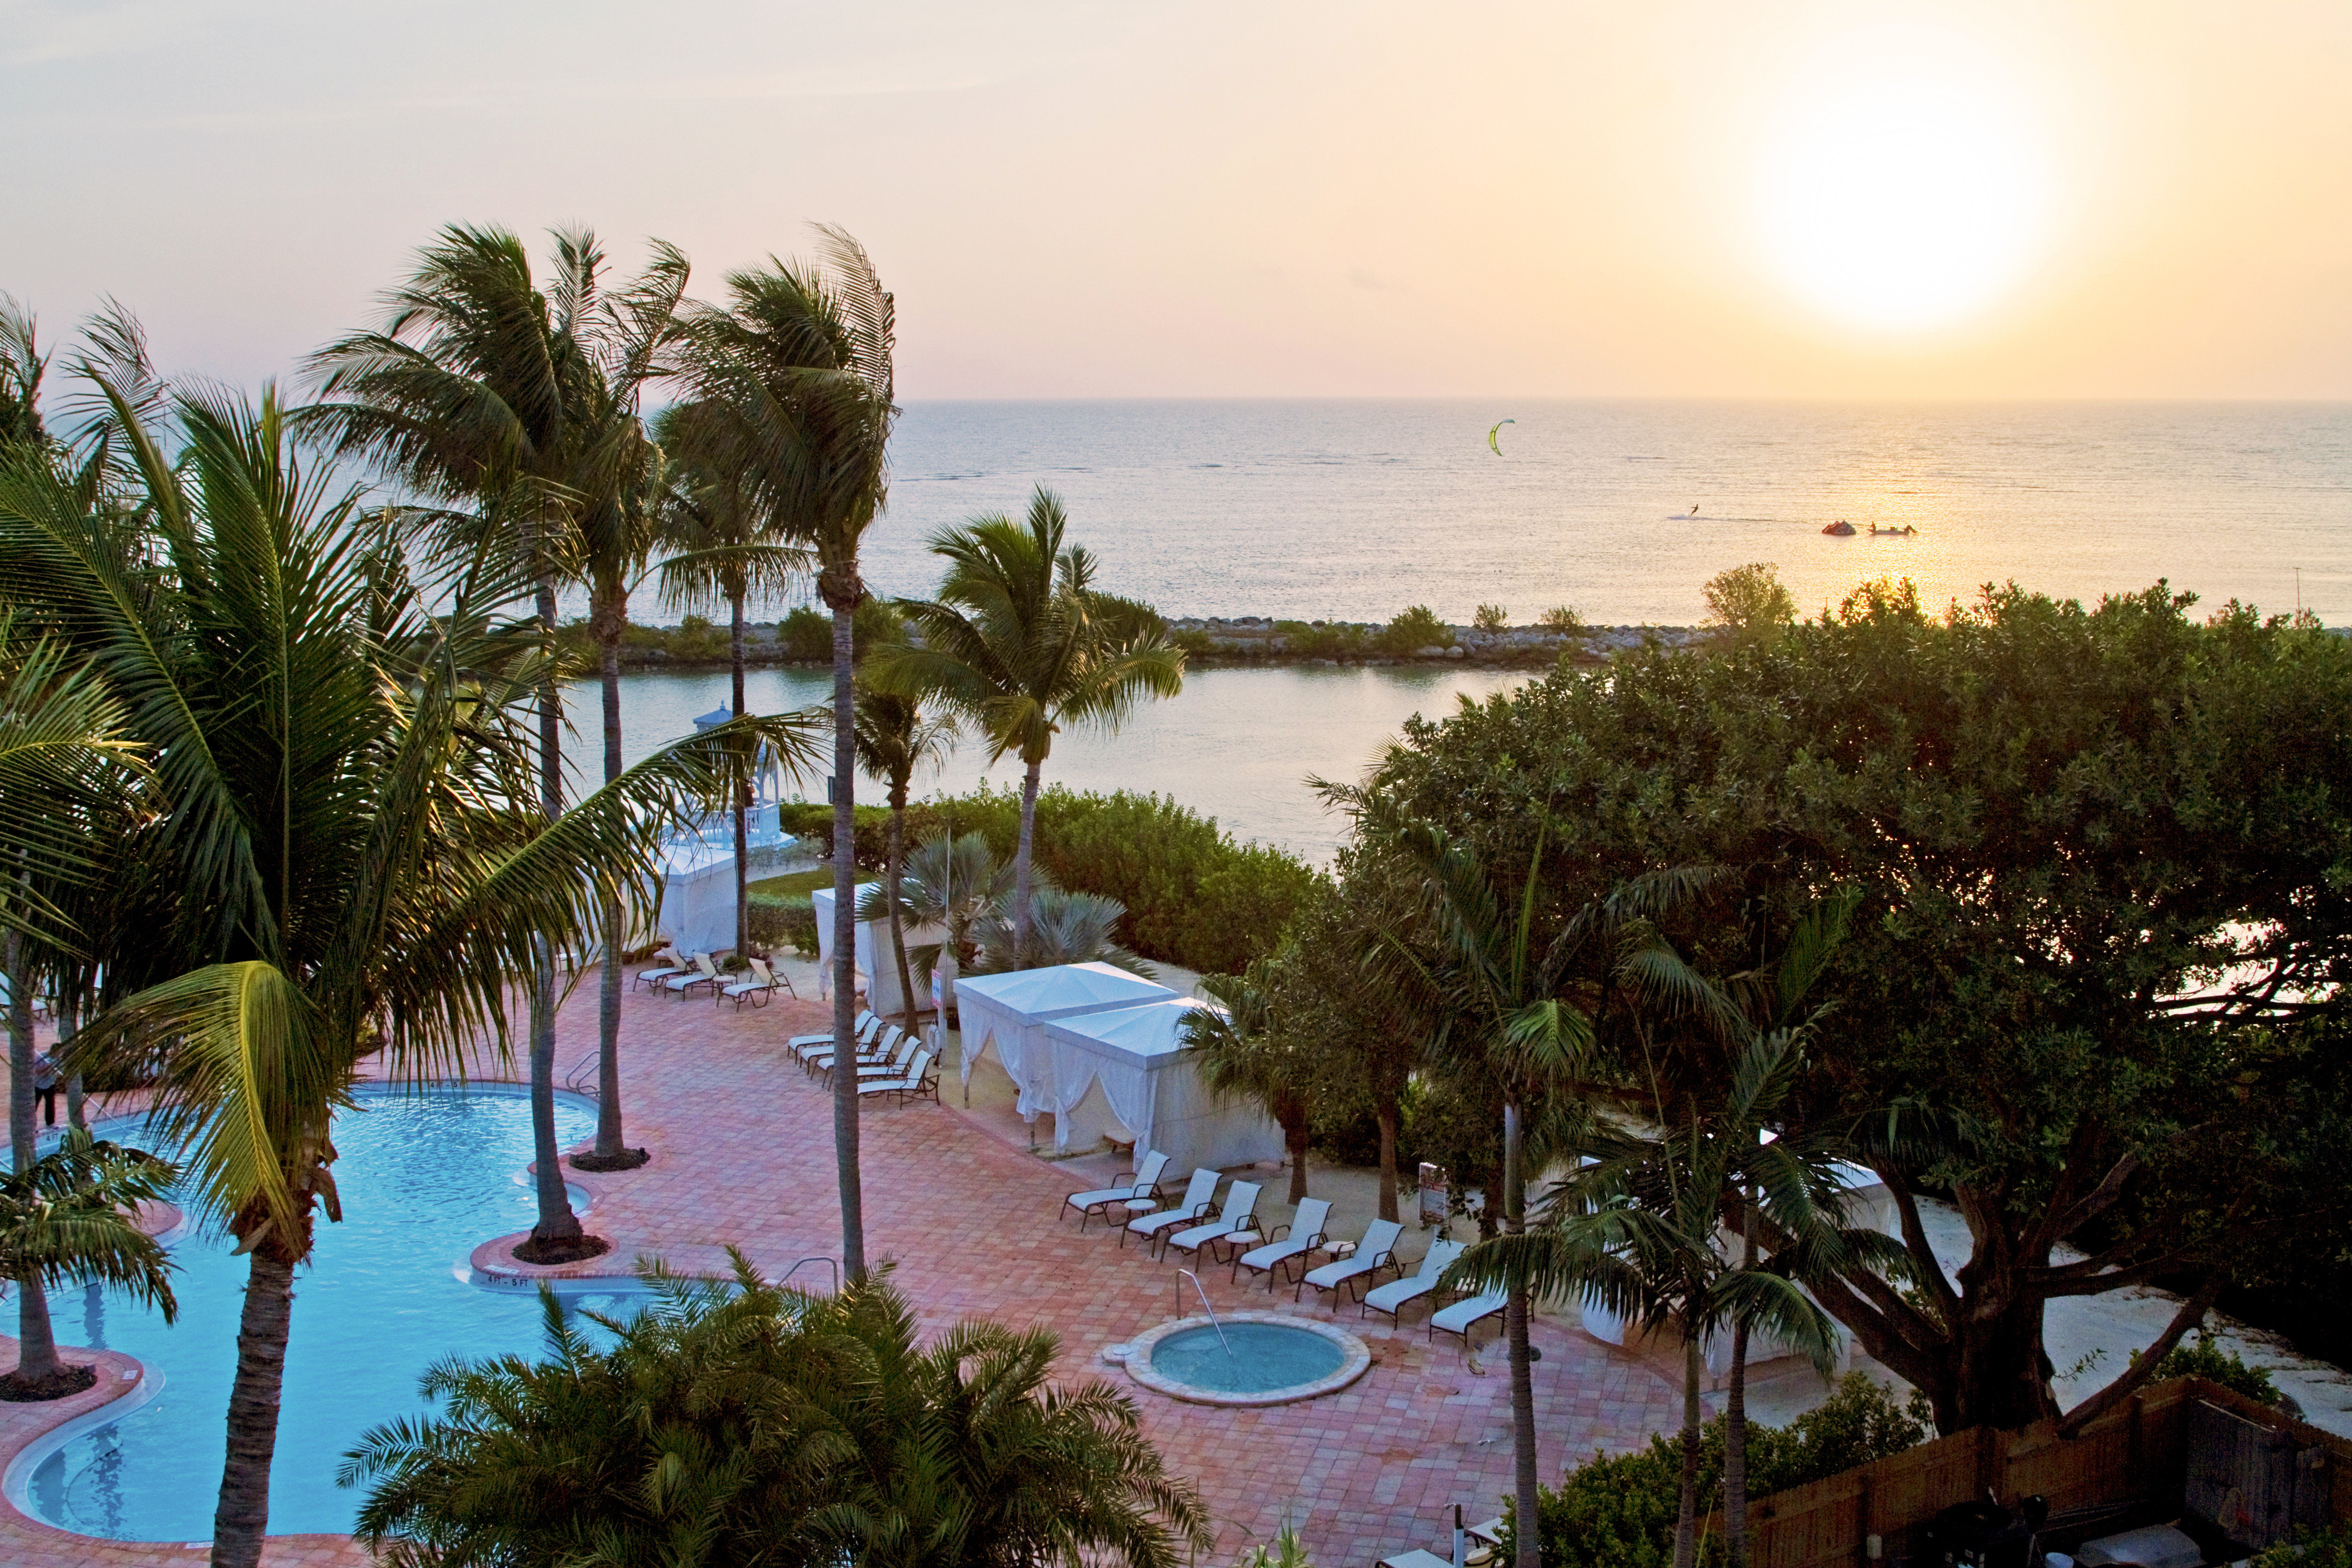 Hot tub/Jacuzzi Lounge Pool Resort tree sky water Beach arecales Ocean Sea plant caribbean Nature Coast palm shore overlooking sandy